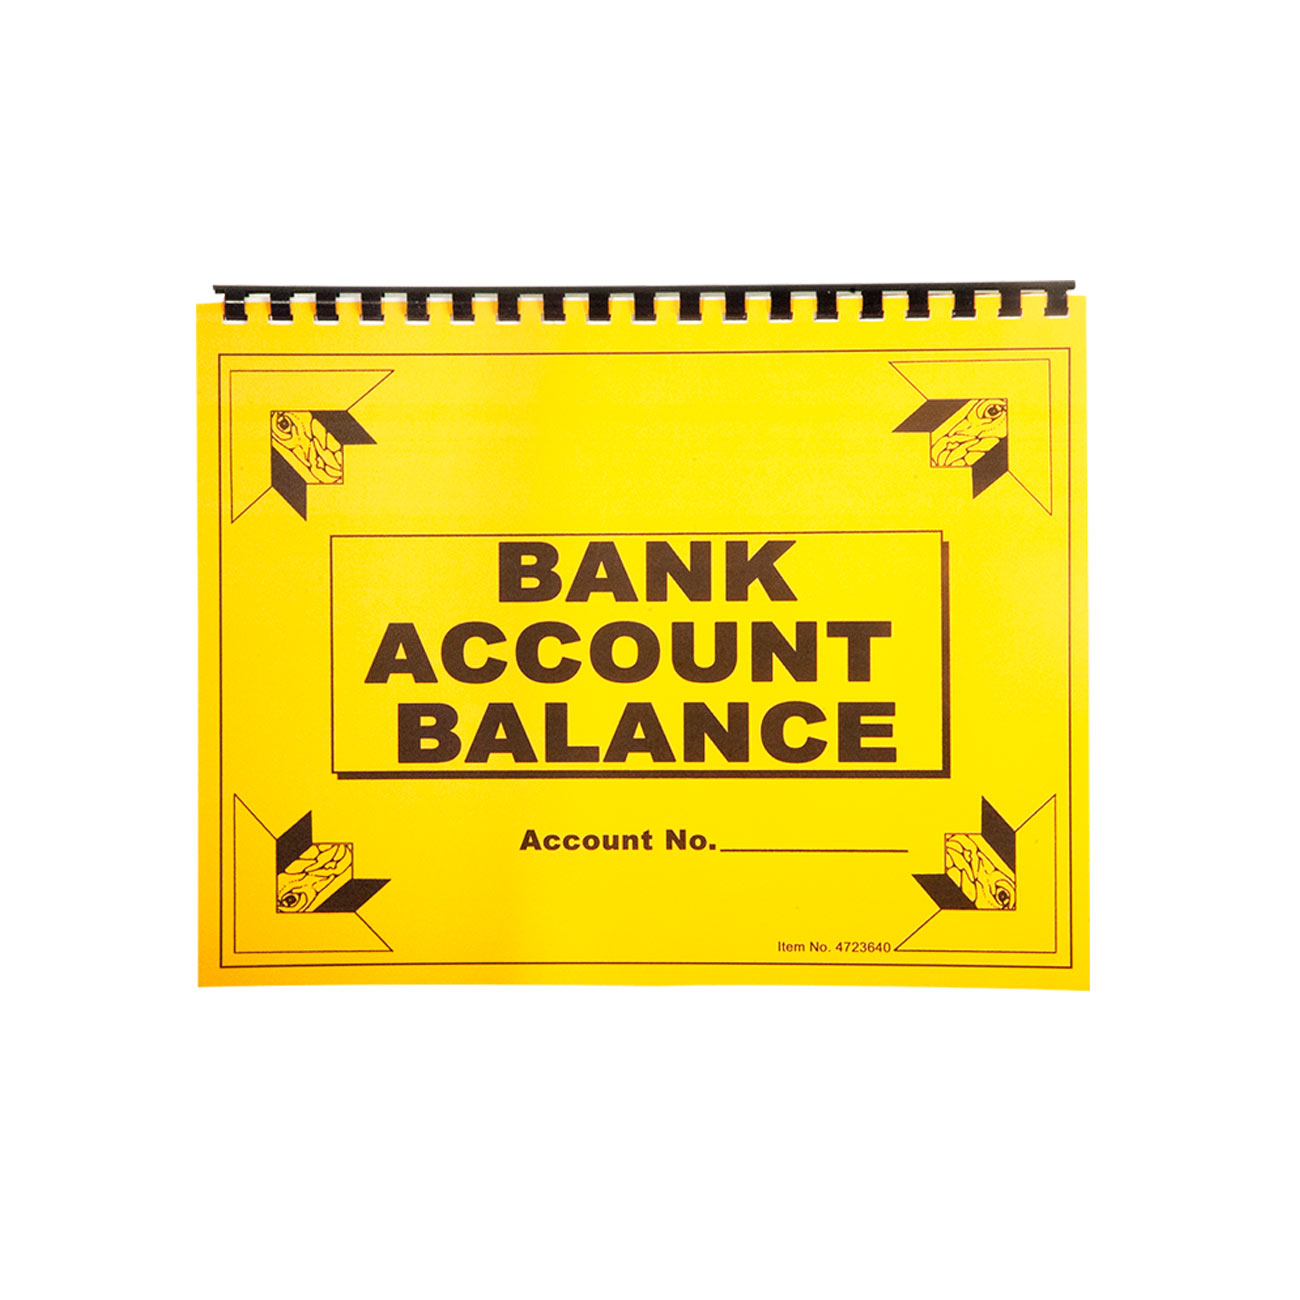 Large Print Check Deposit Register